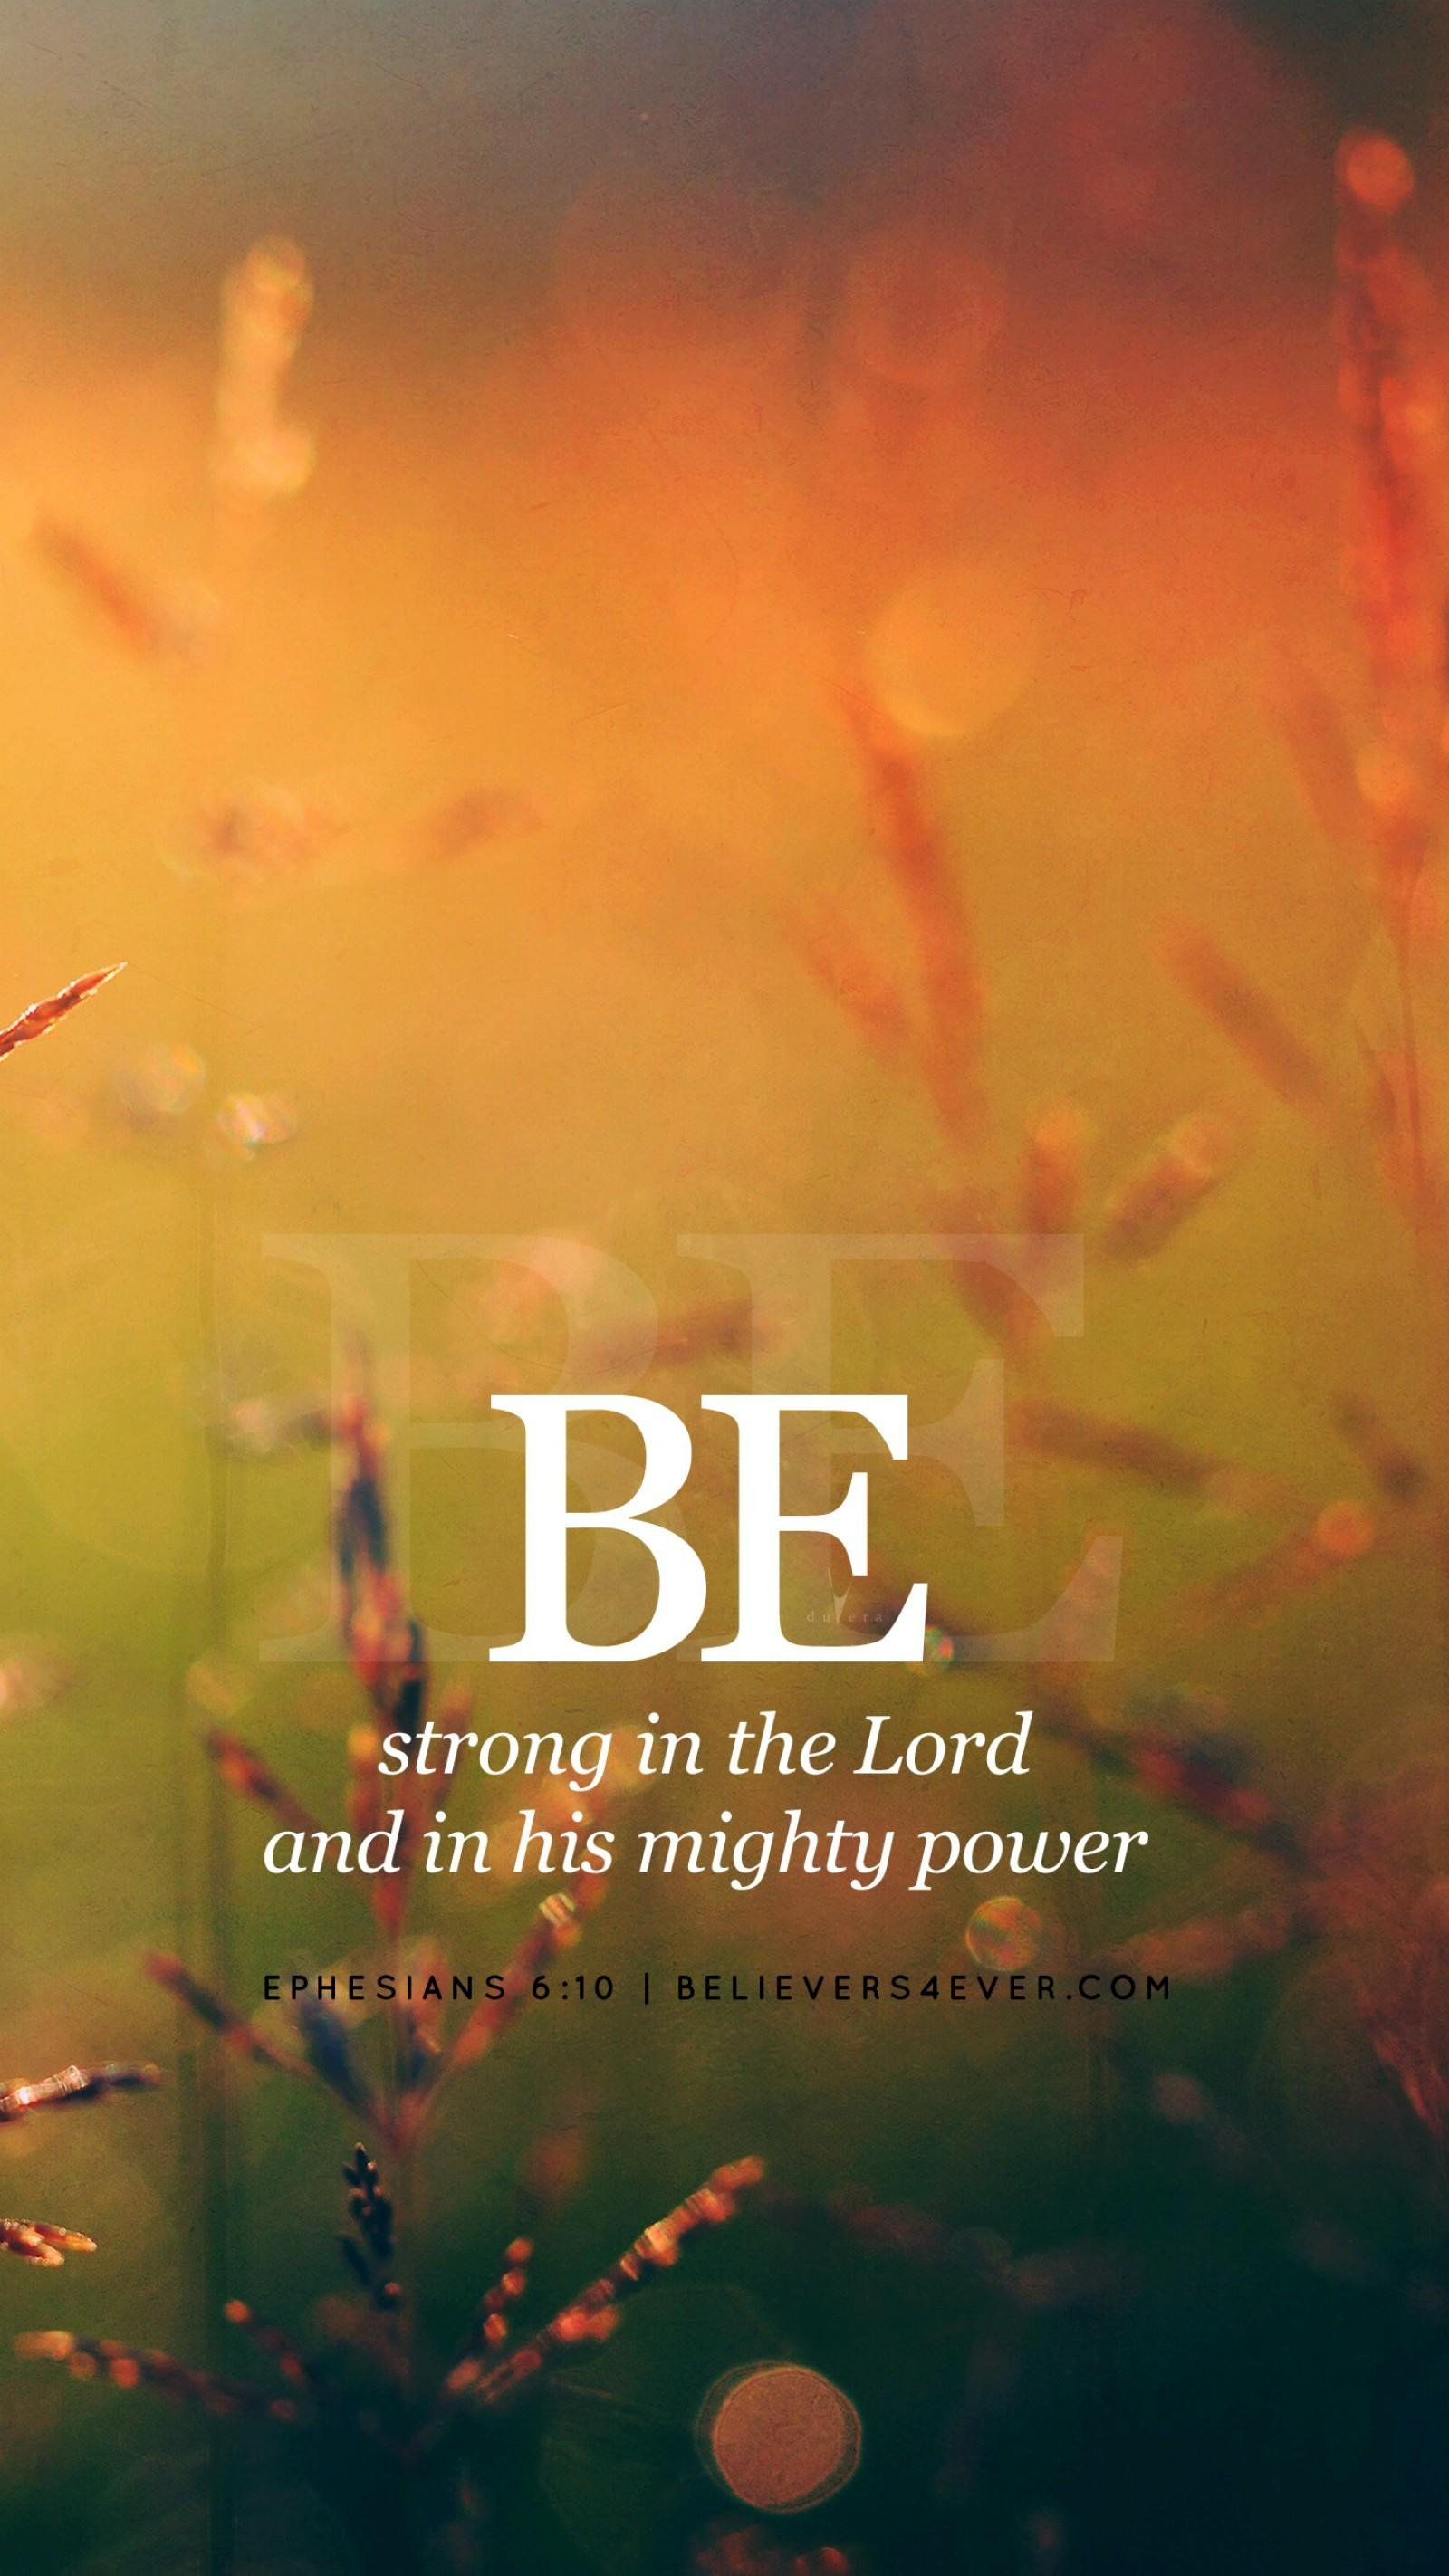 Spiritual Bible Verses Hd Wallpapers For Mobile